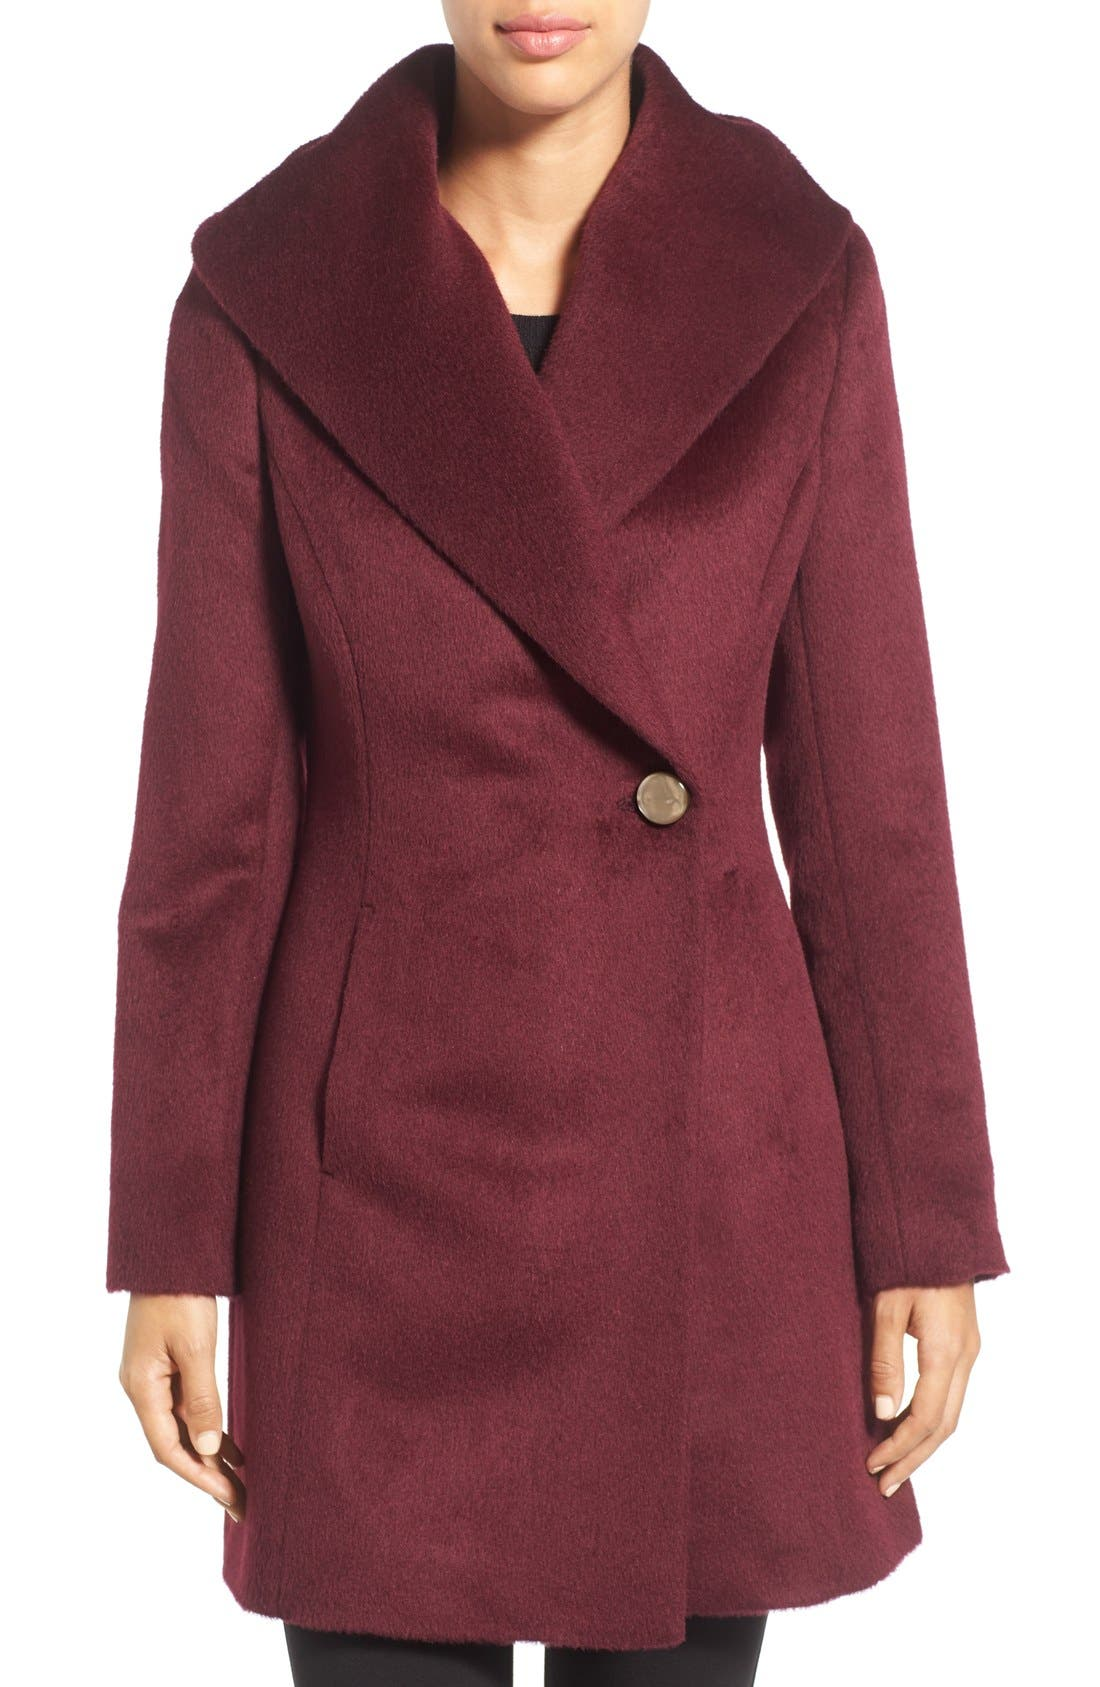 Alternate Image 1 Selected - Trina Turk 'Bonnie' Shawl Collar Skirted Coat (Regular & Petite)